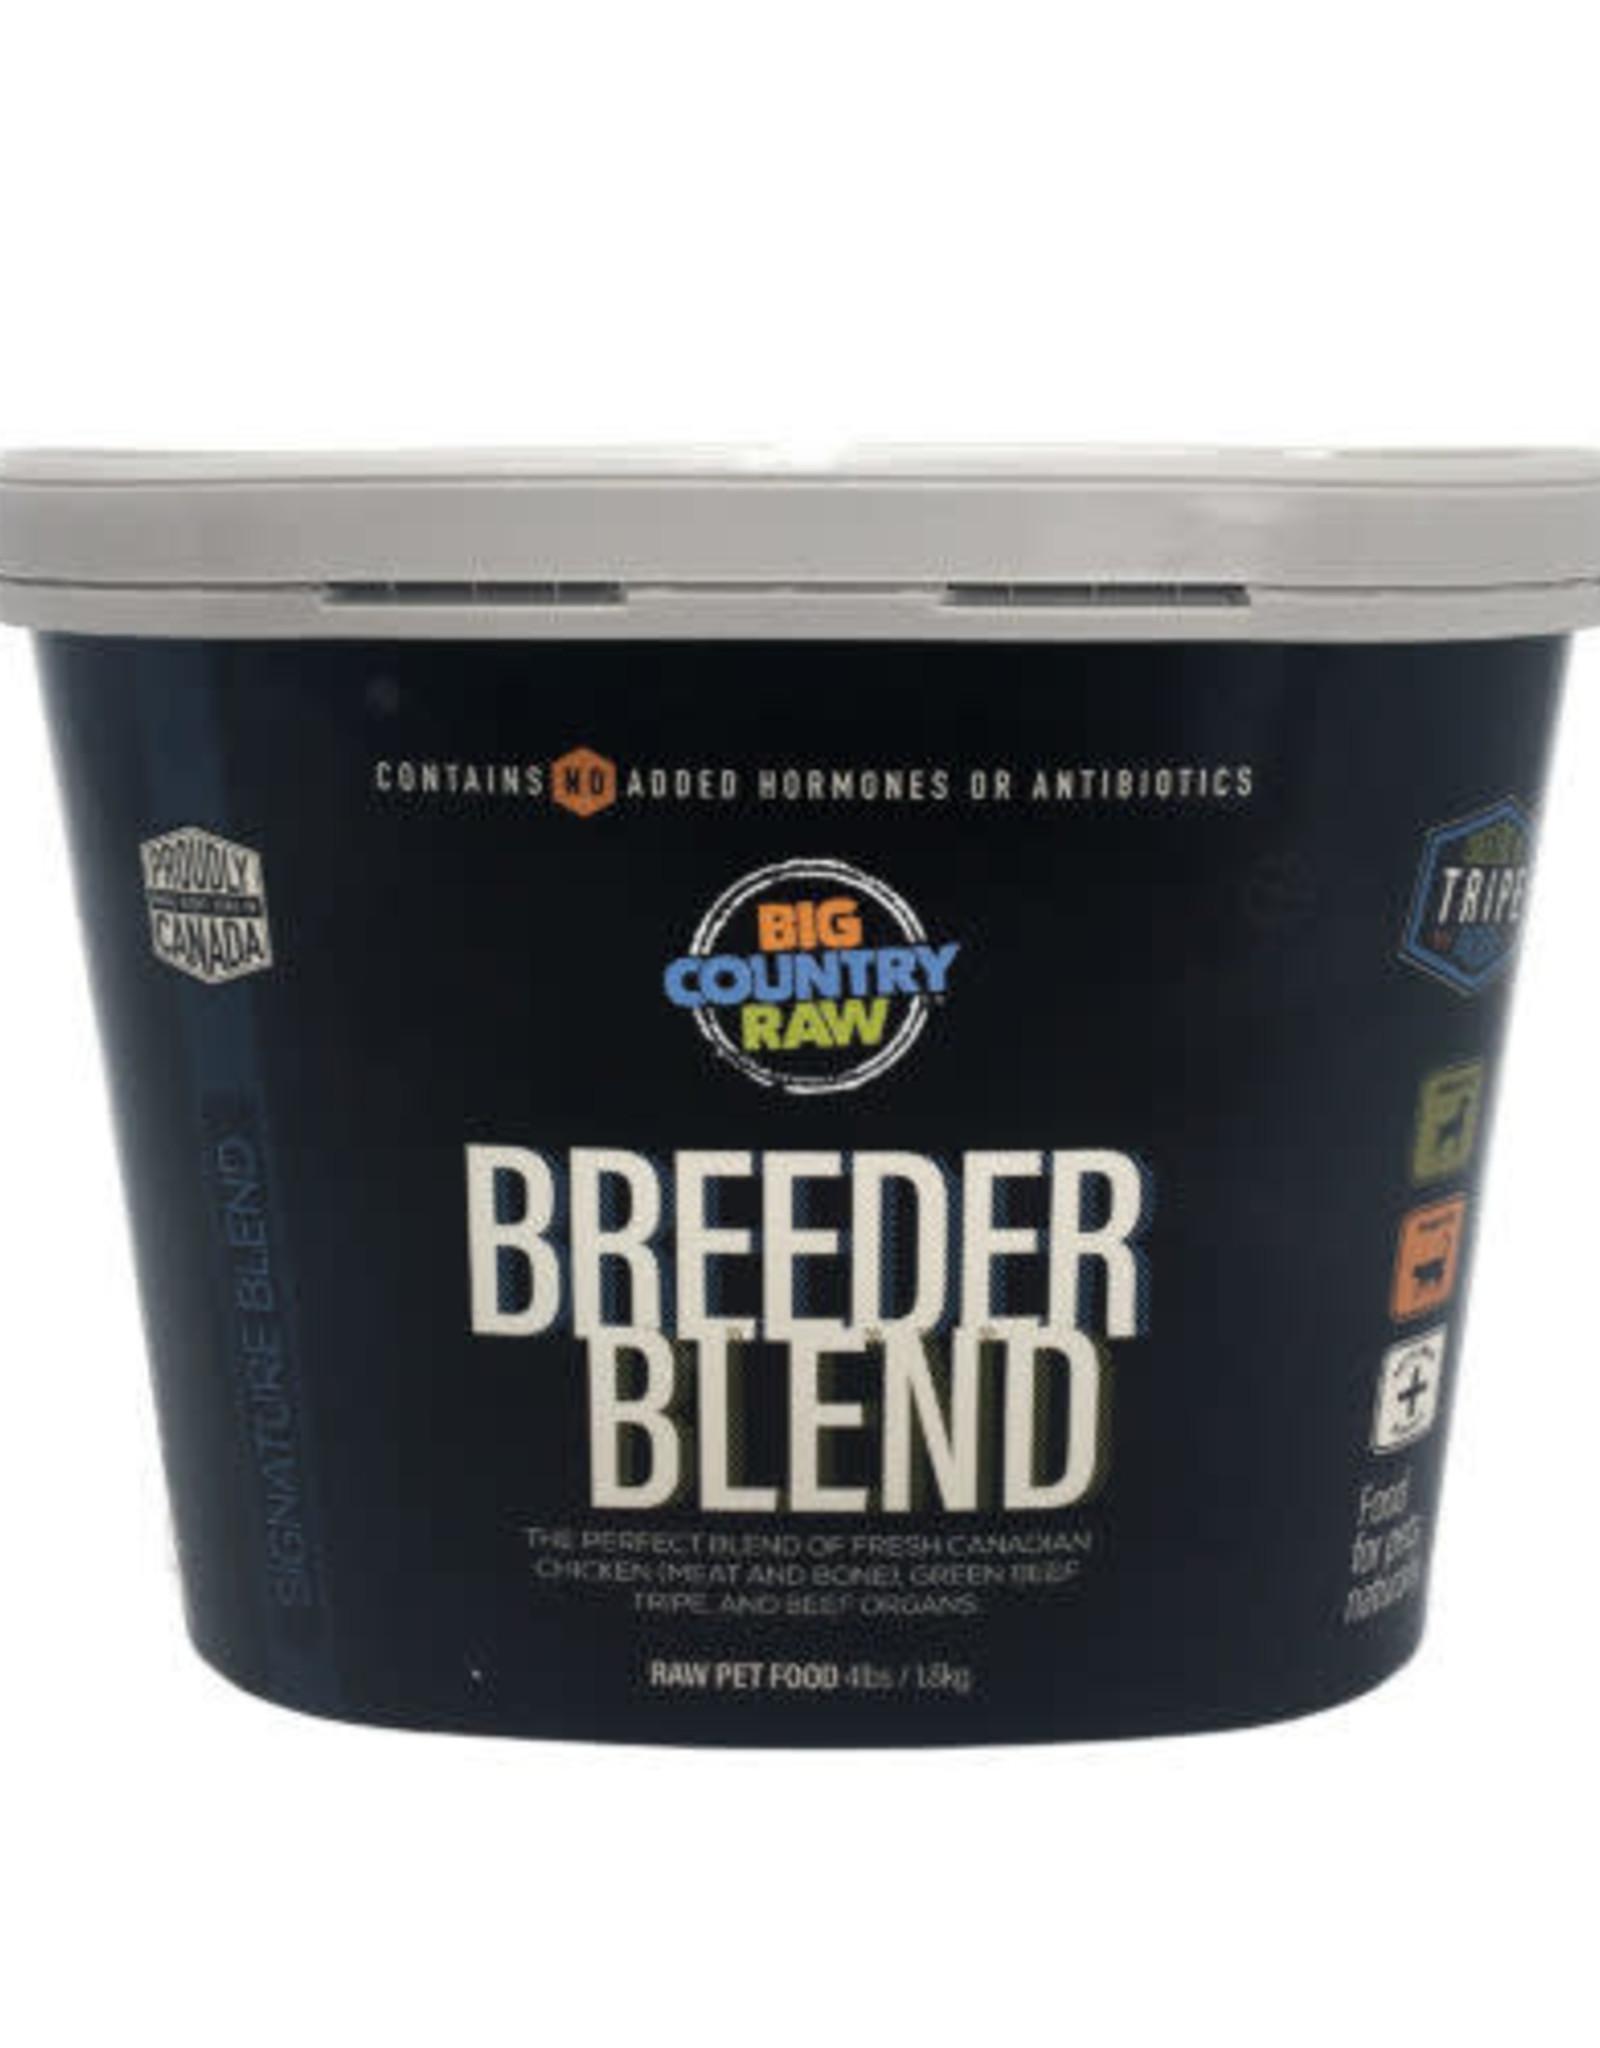 Big Country Raw Big Country Raw Breeder Blend Tub 4lbs